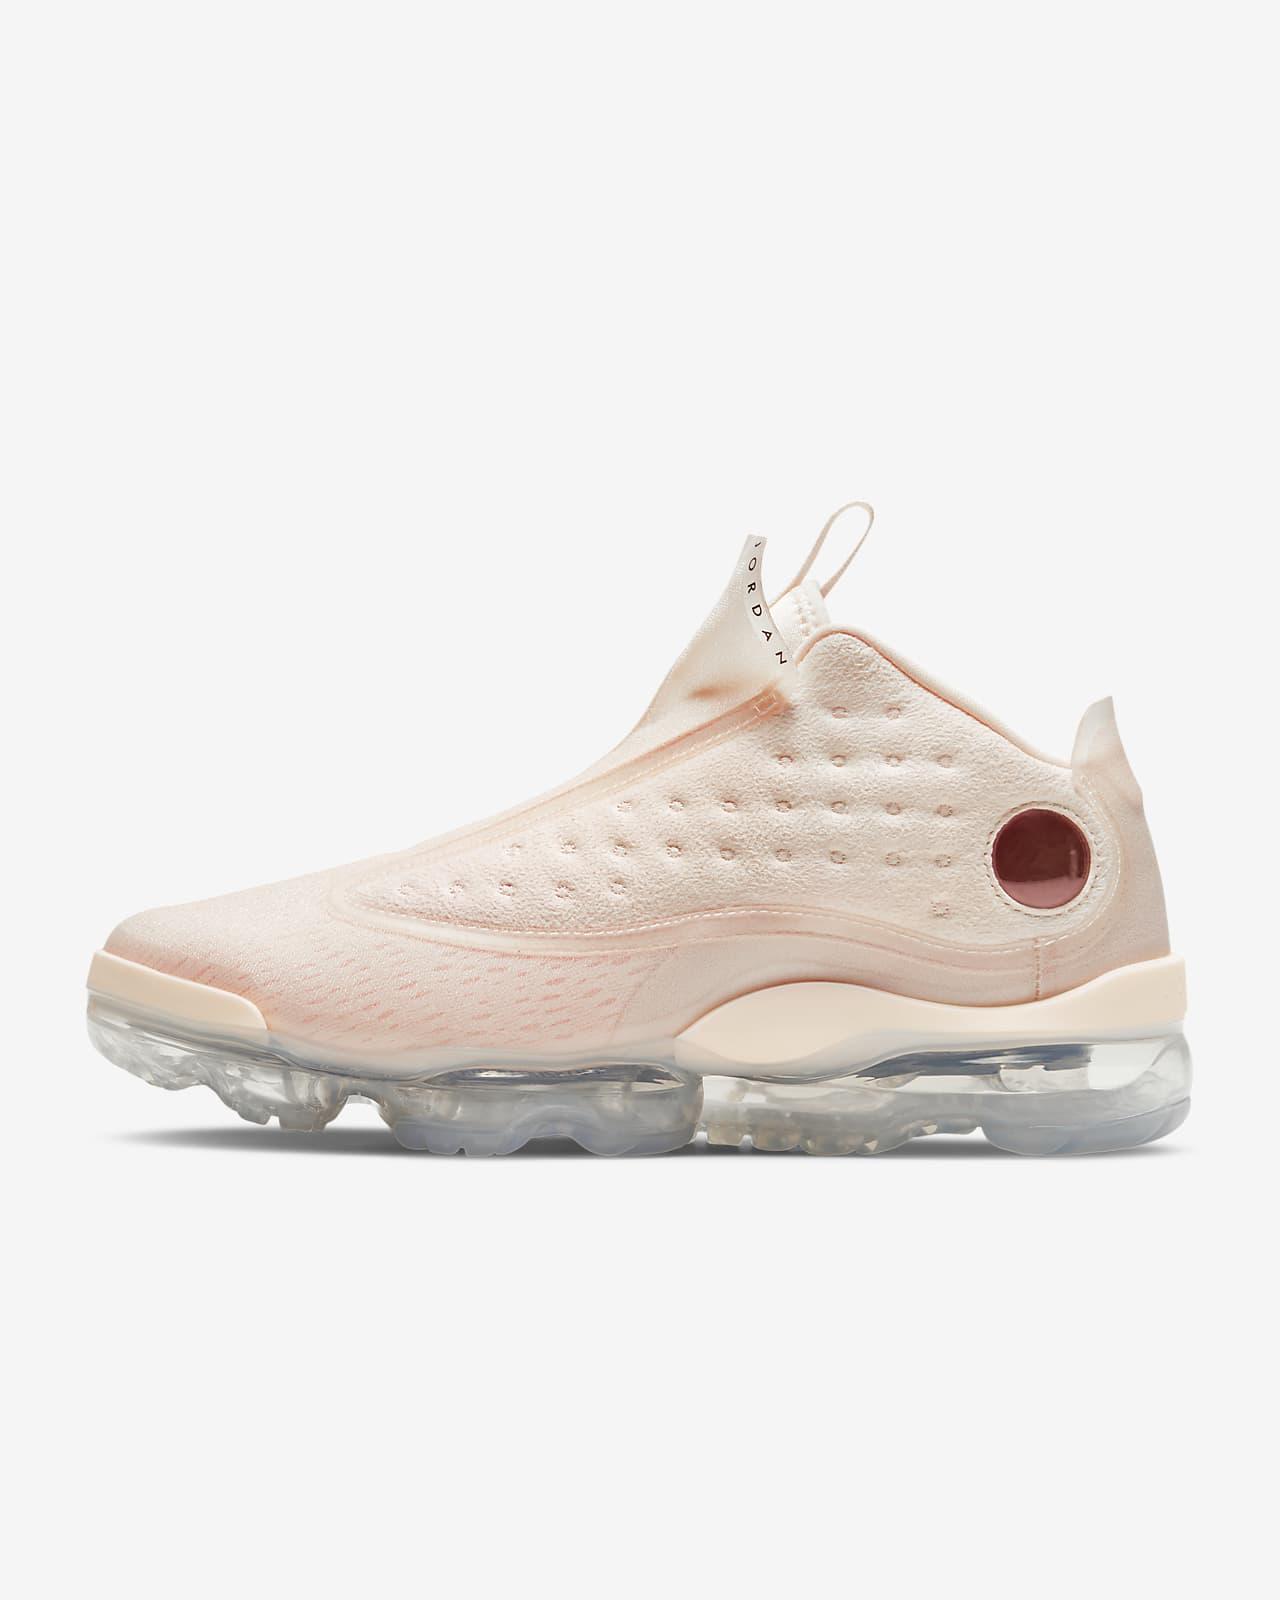 Air Jordan Reign 女子运动鞋